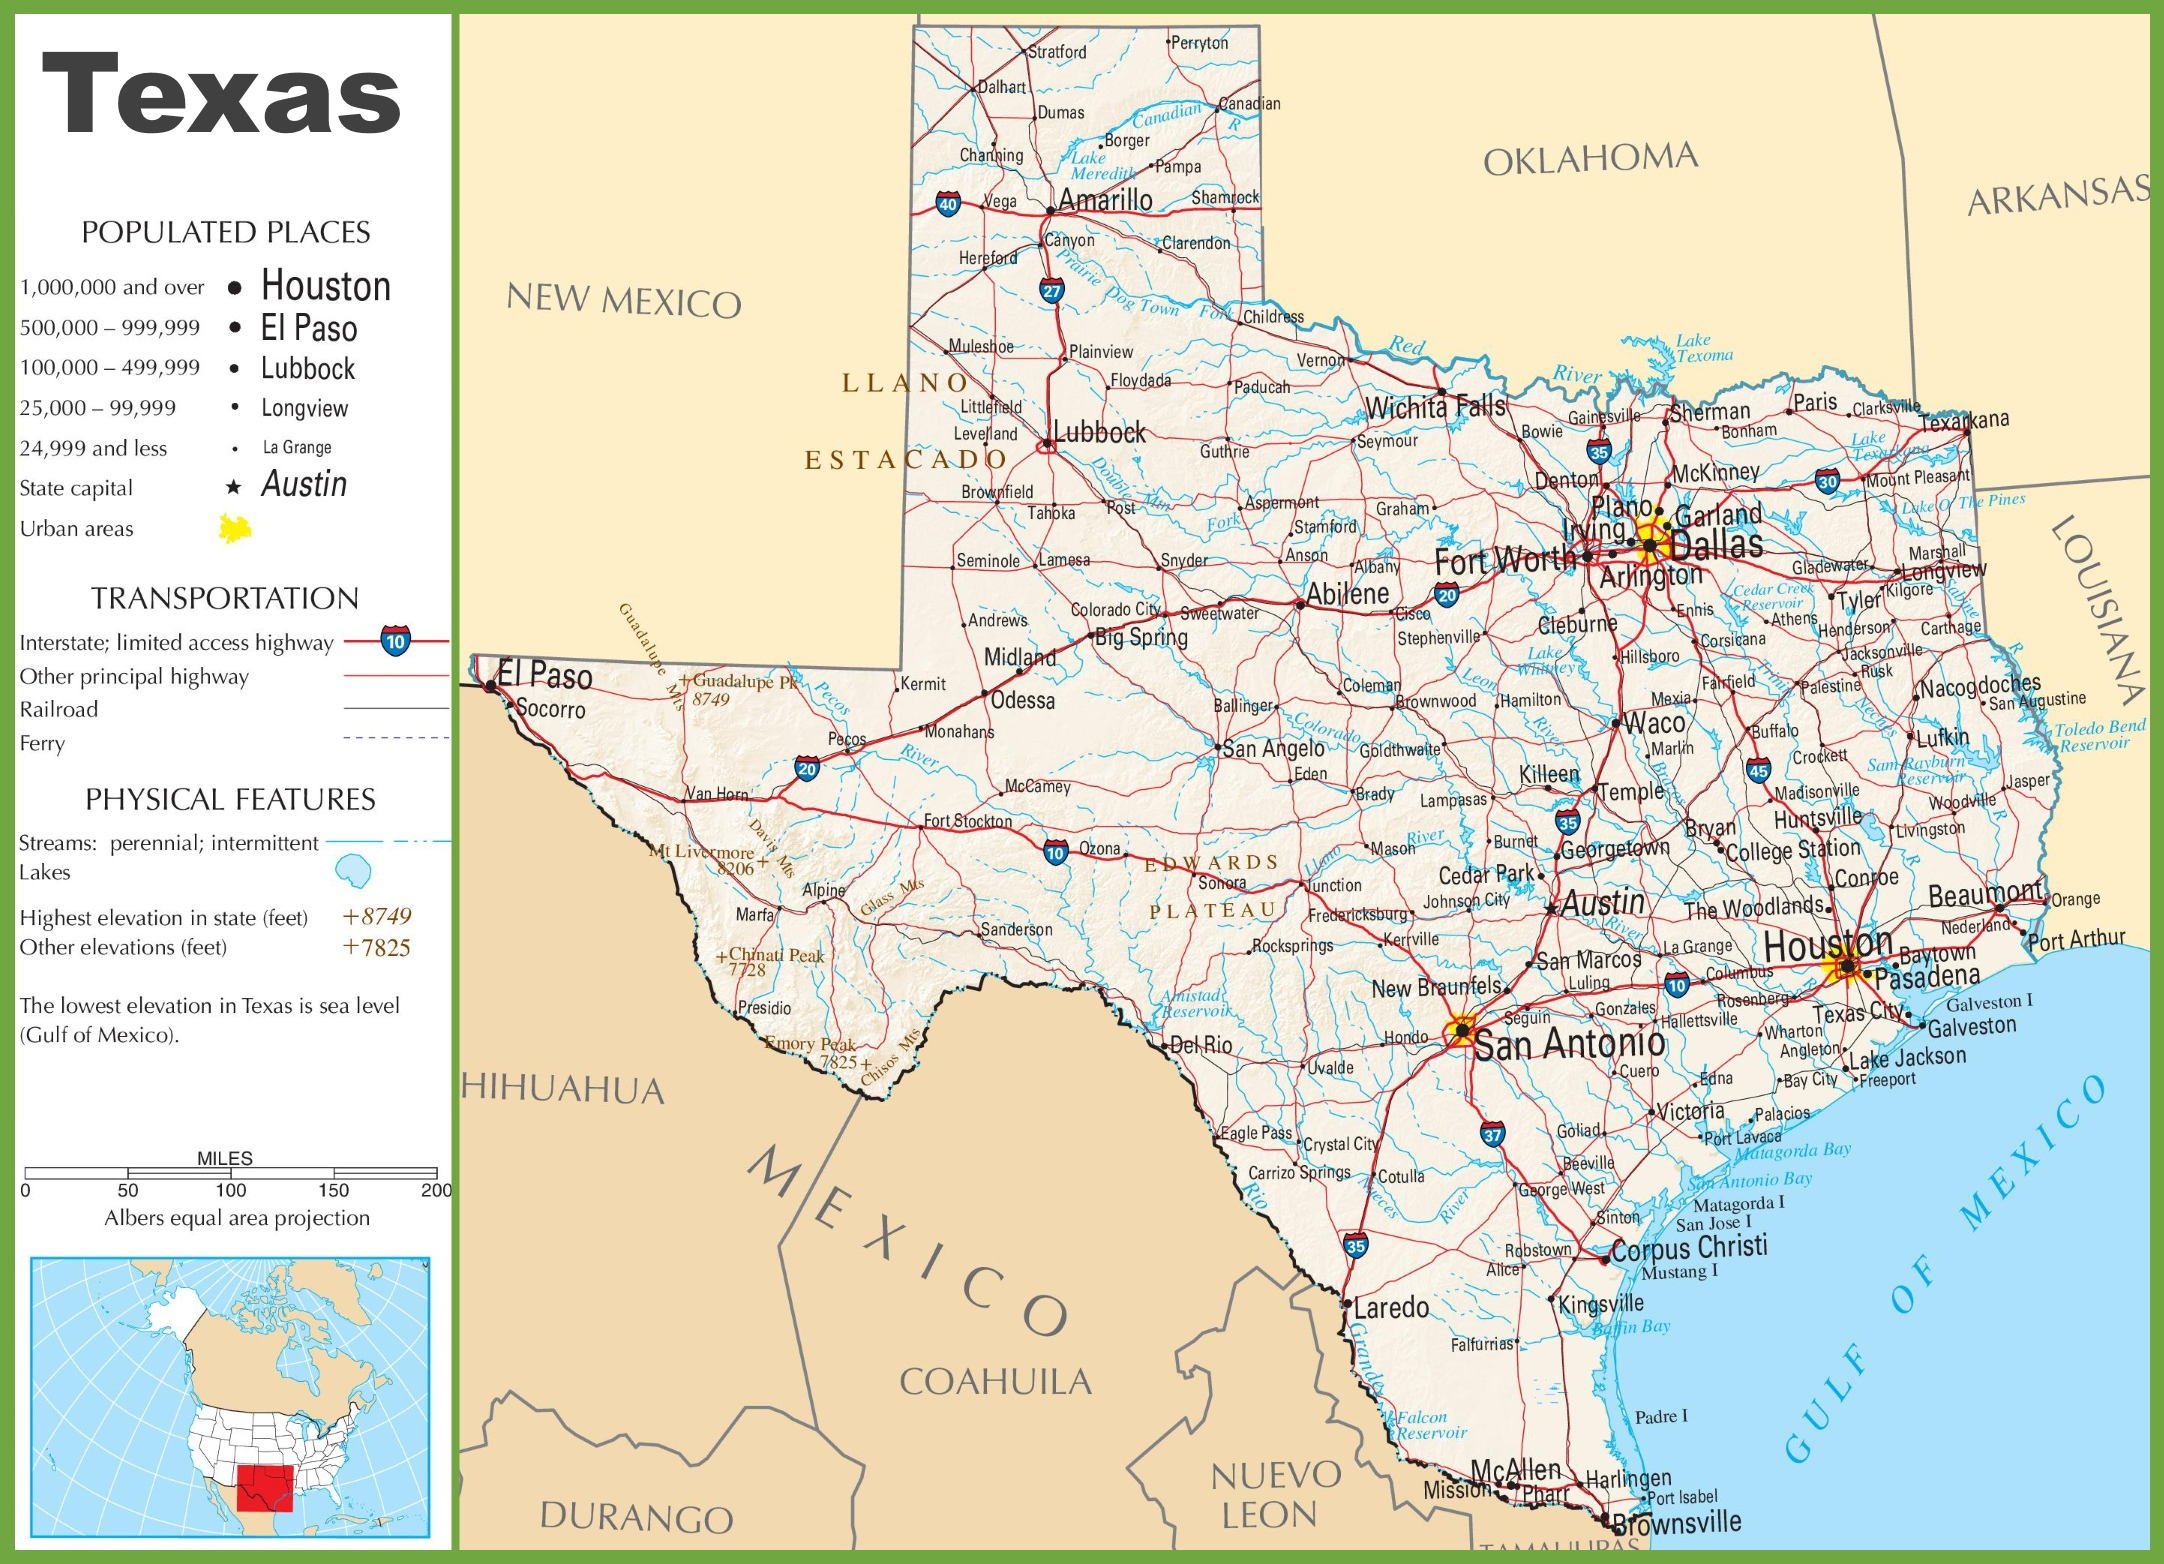 Texas Highway Map - Texas Road Map Google